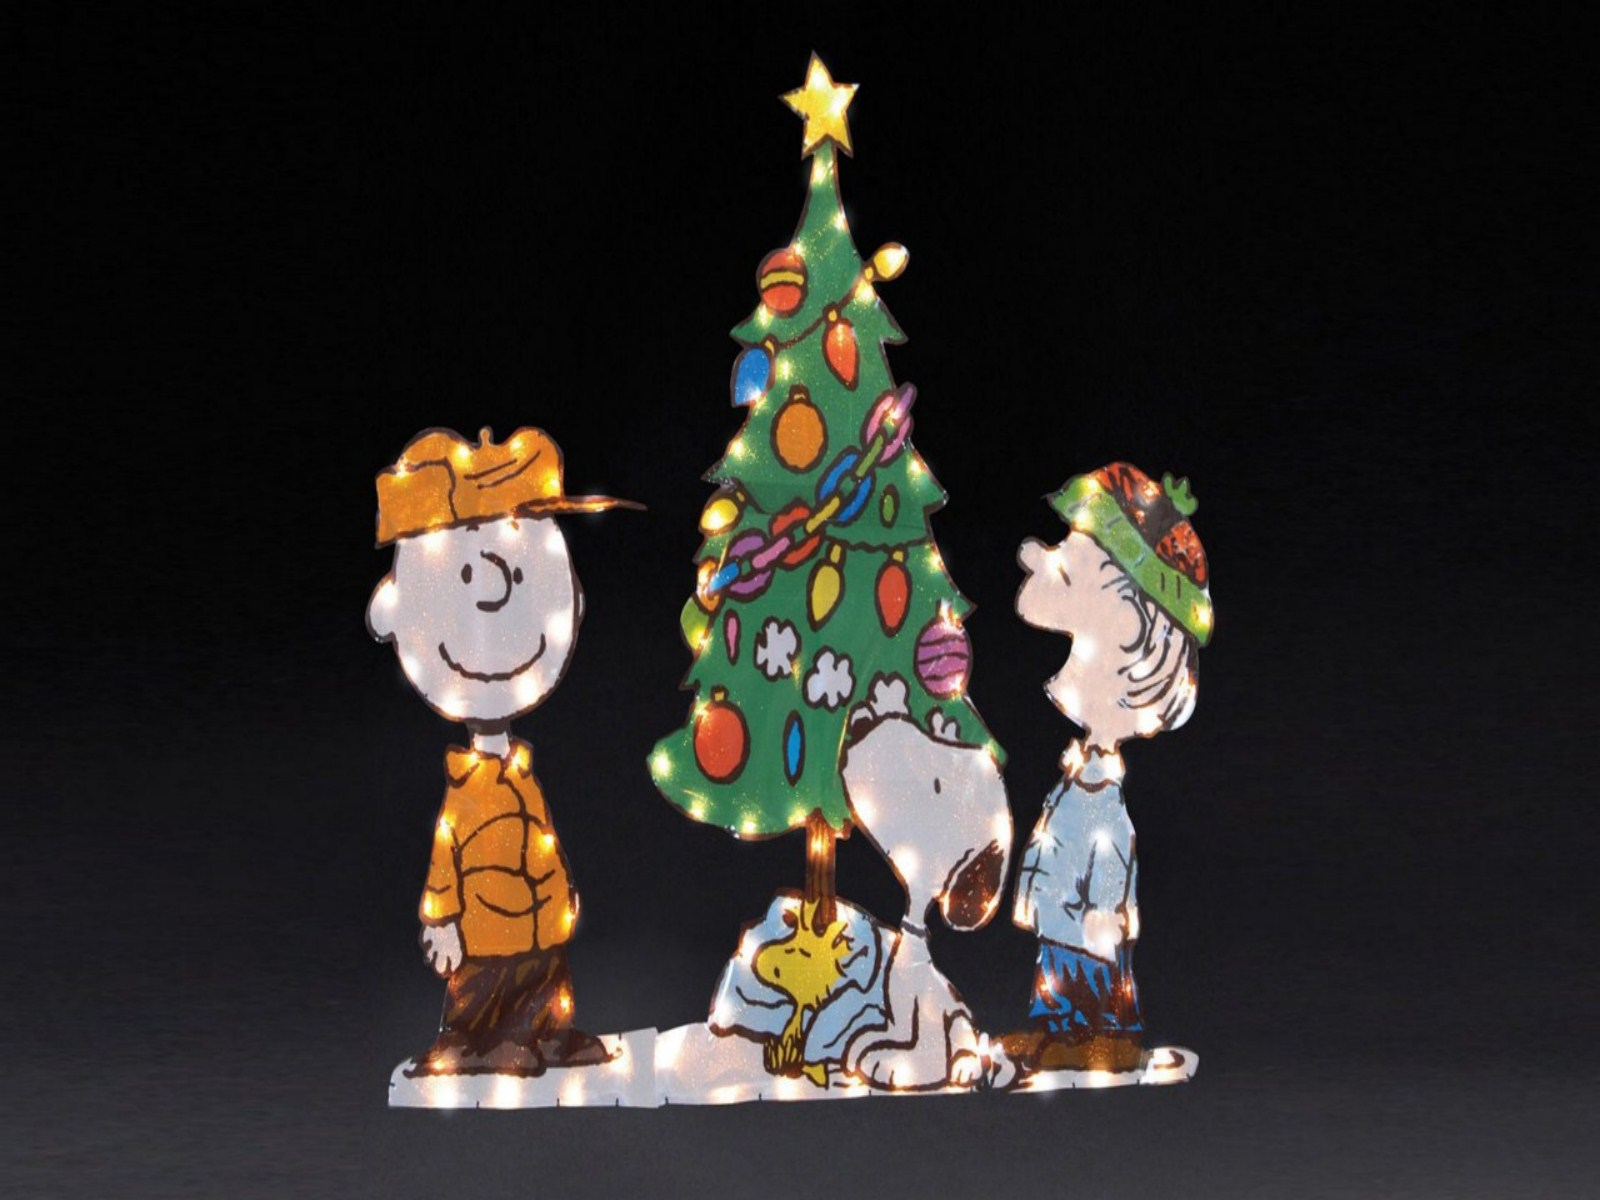 Snoopy Christmas Wallpaper Widescreen 1600x1200